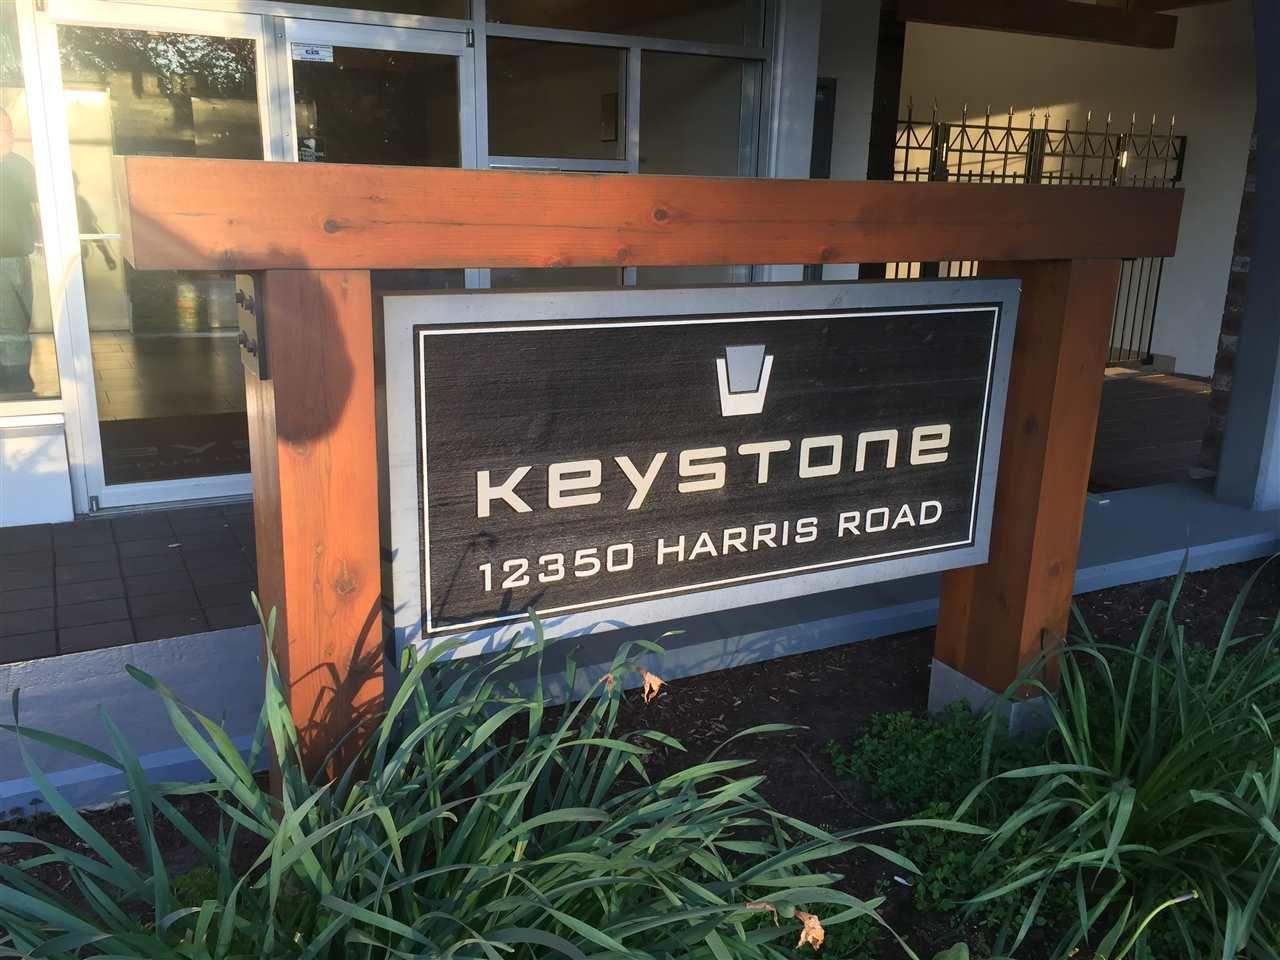 "Main Photo: 320 12350 HARRIS Road in Pitt Meadows: Mid Meadows Condo for sale in ""KEYSTONE"" : MLS®# R2073144"